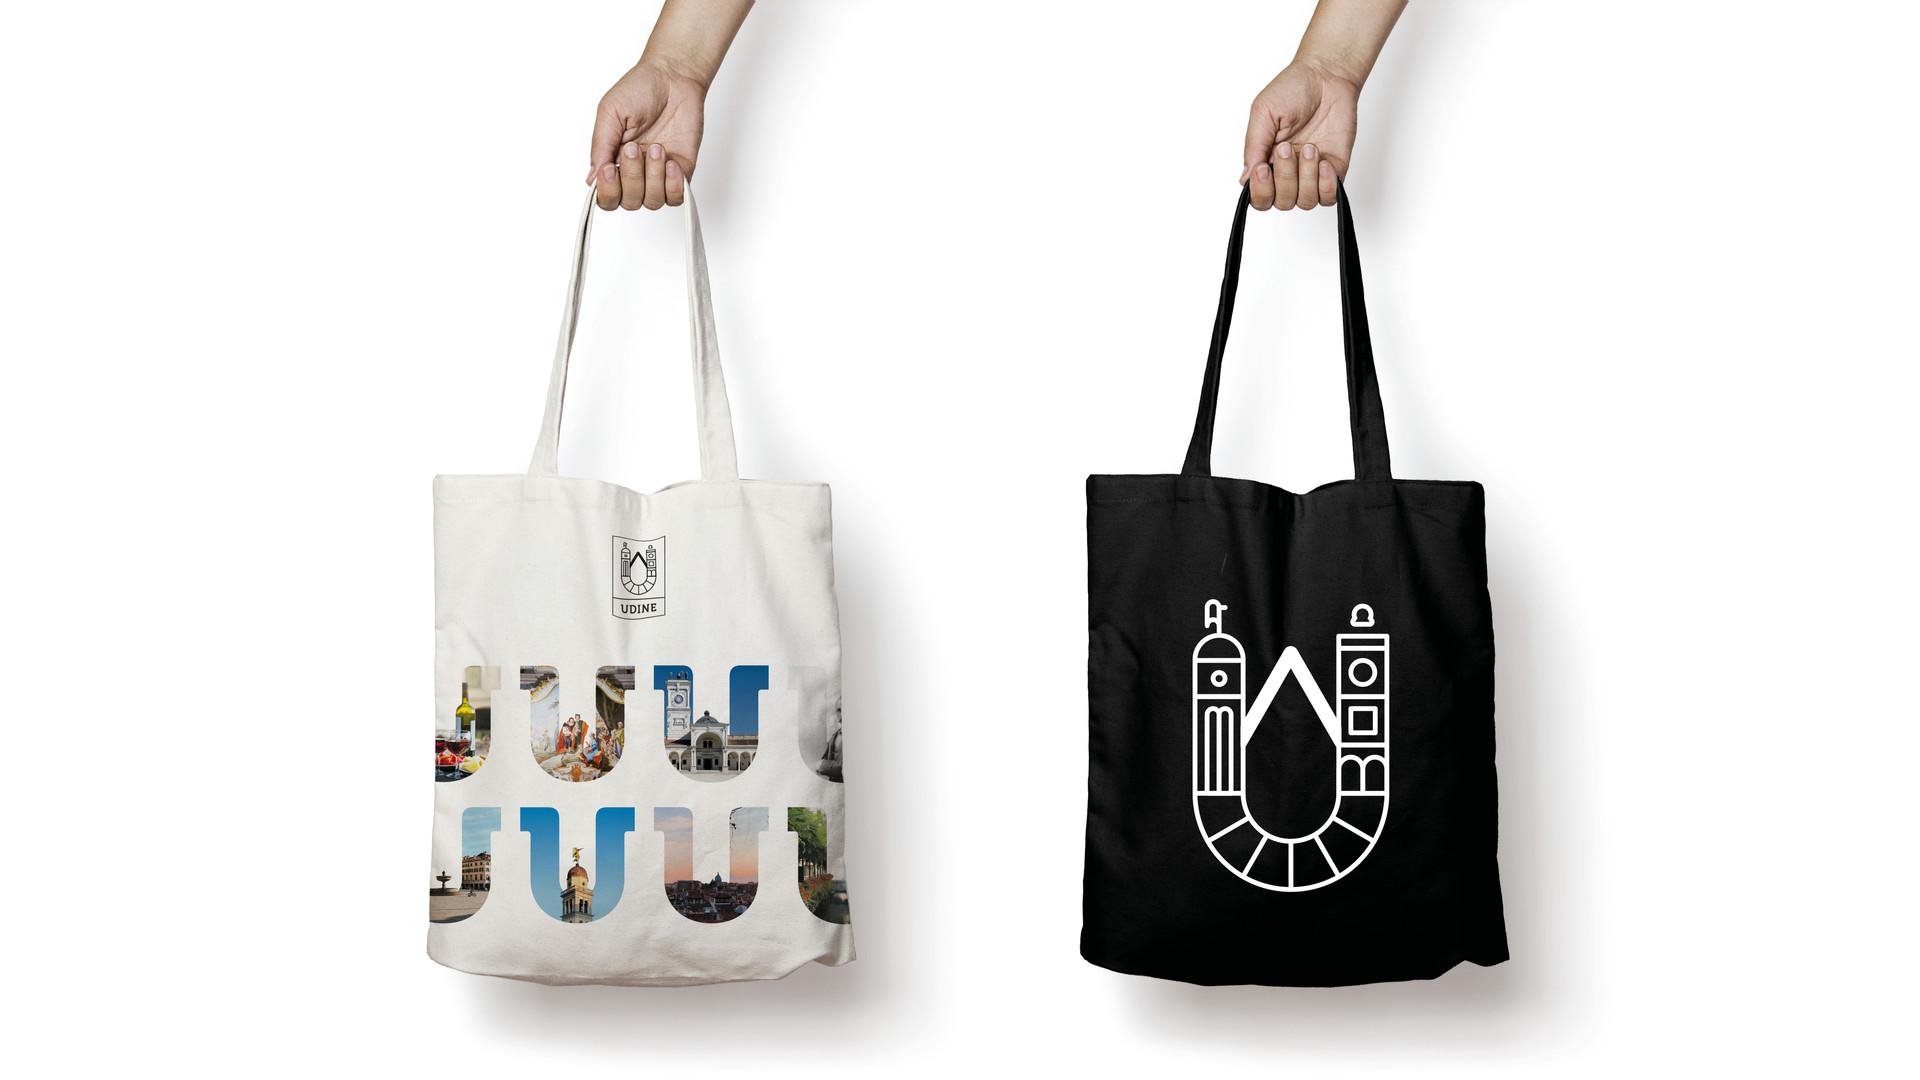 UDINE city branding tote bags